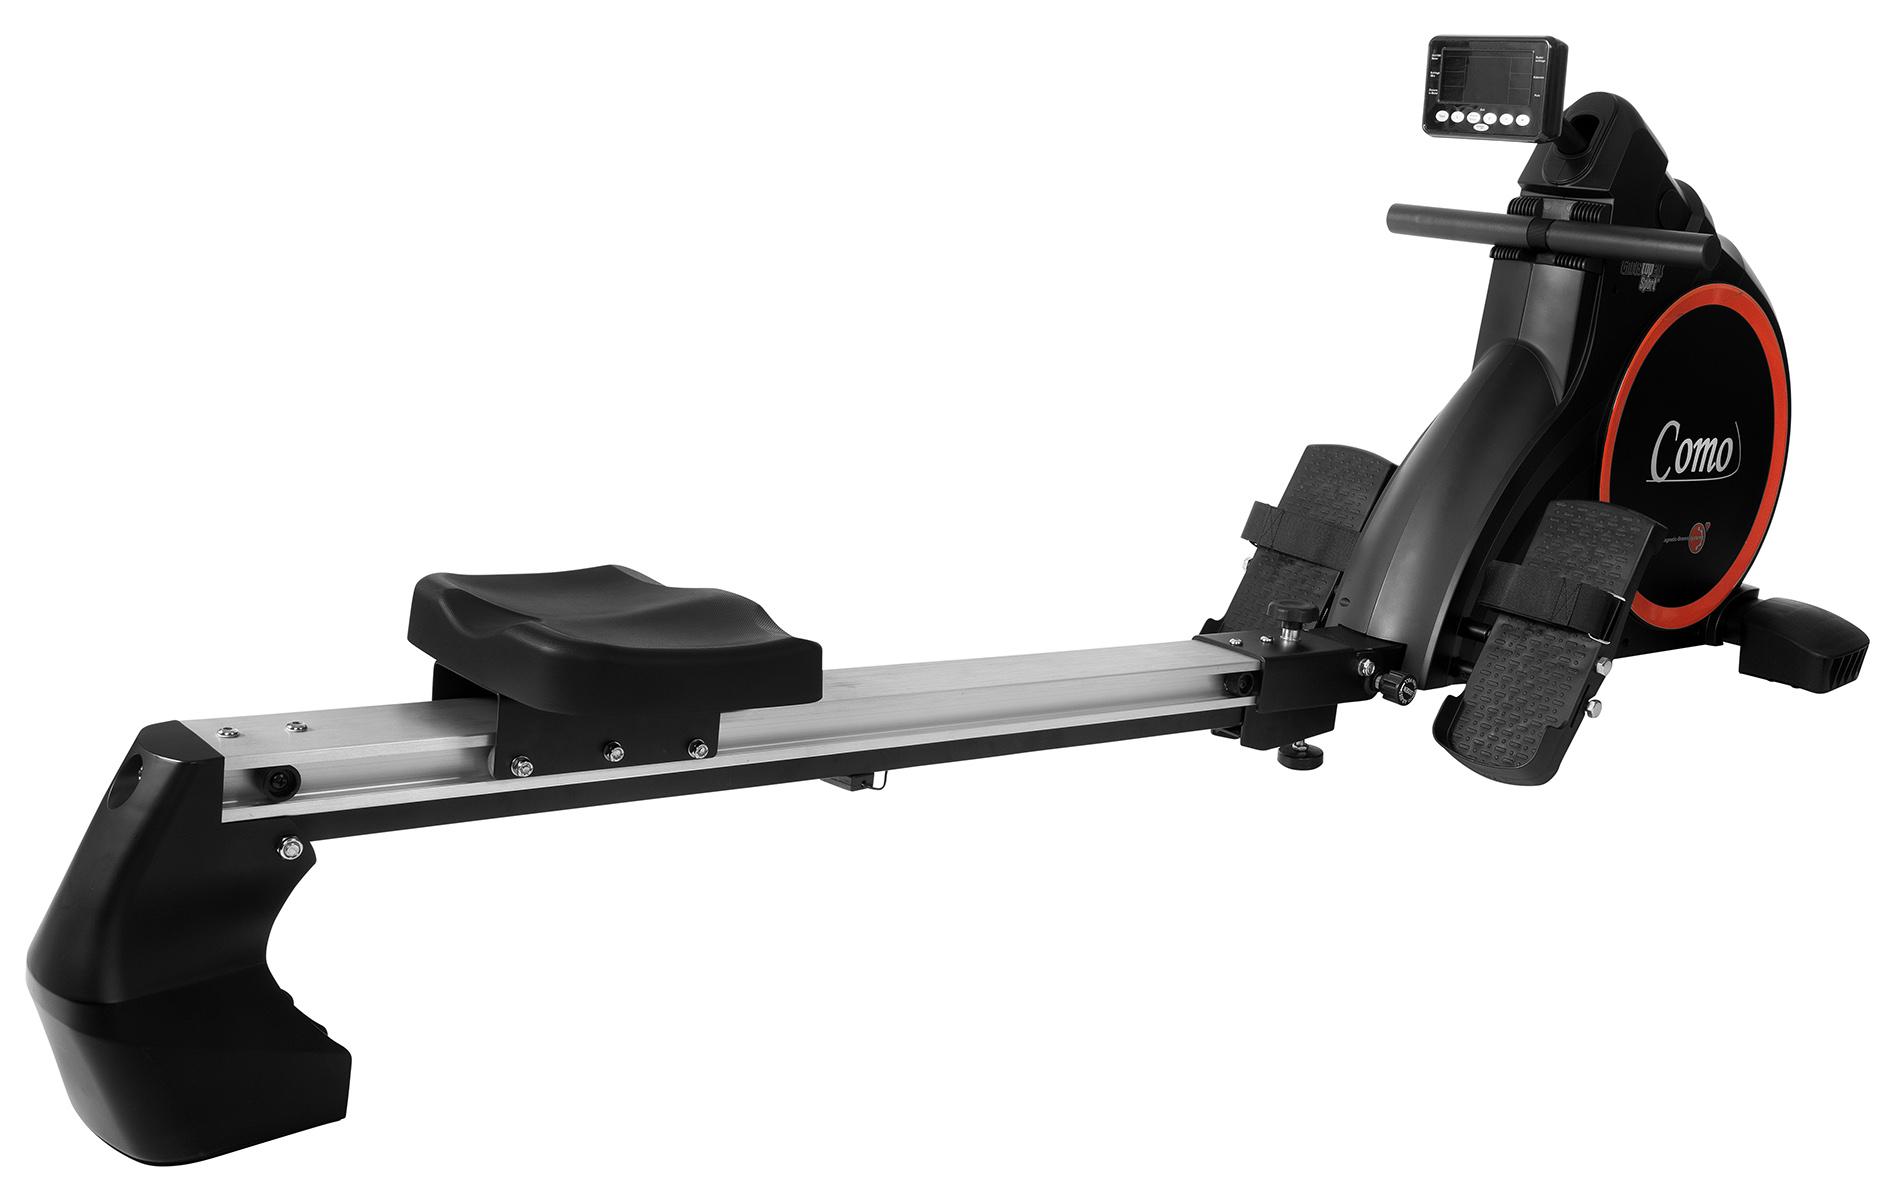 Ruderzugmaschine Como – Black Edition